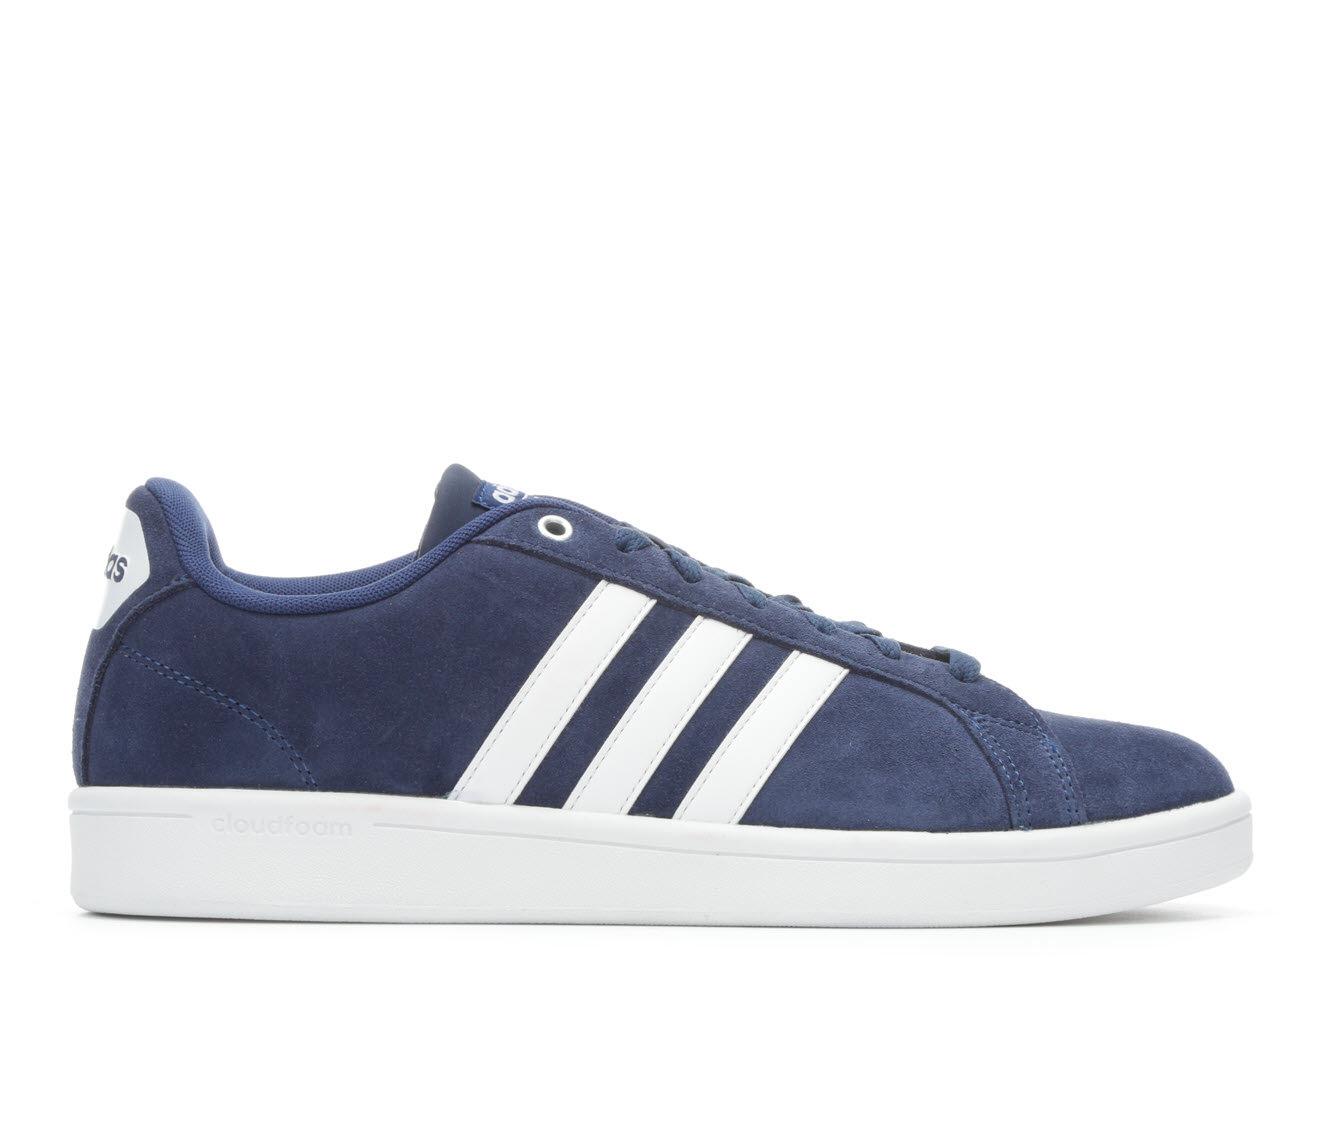 Men's Adidas Cloudfoam Advantage Stripe Sneakers (Blue - Size 7) 1655064